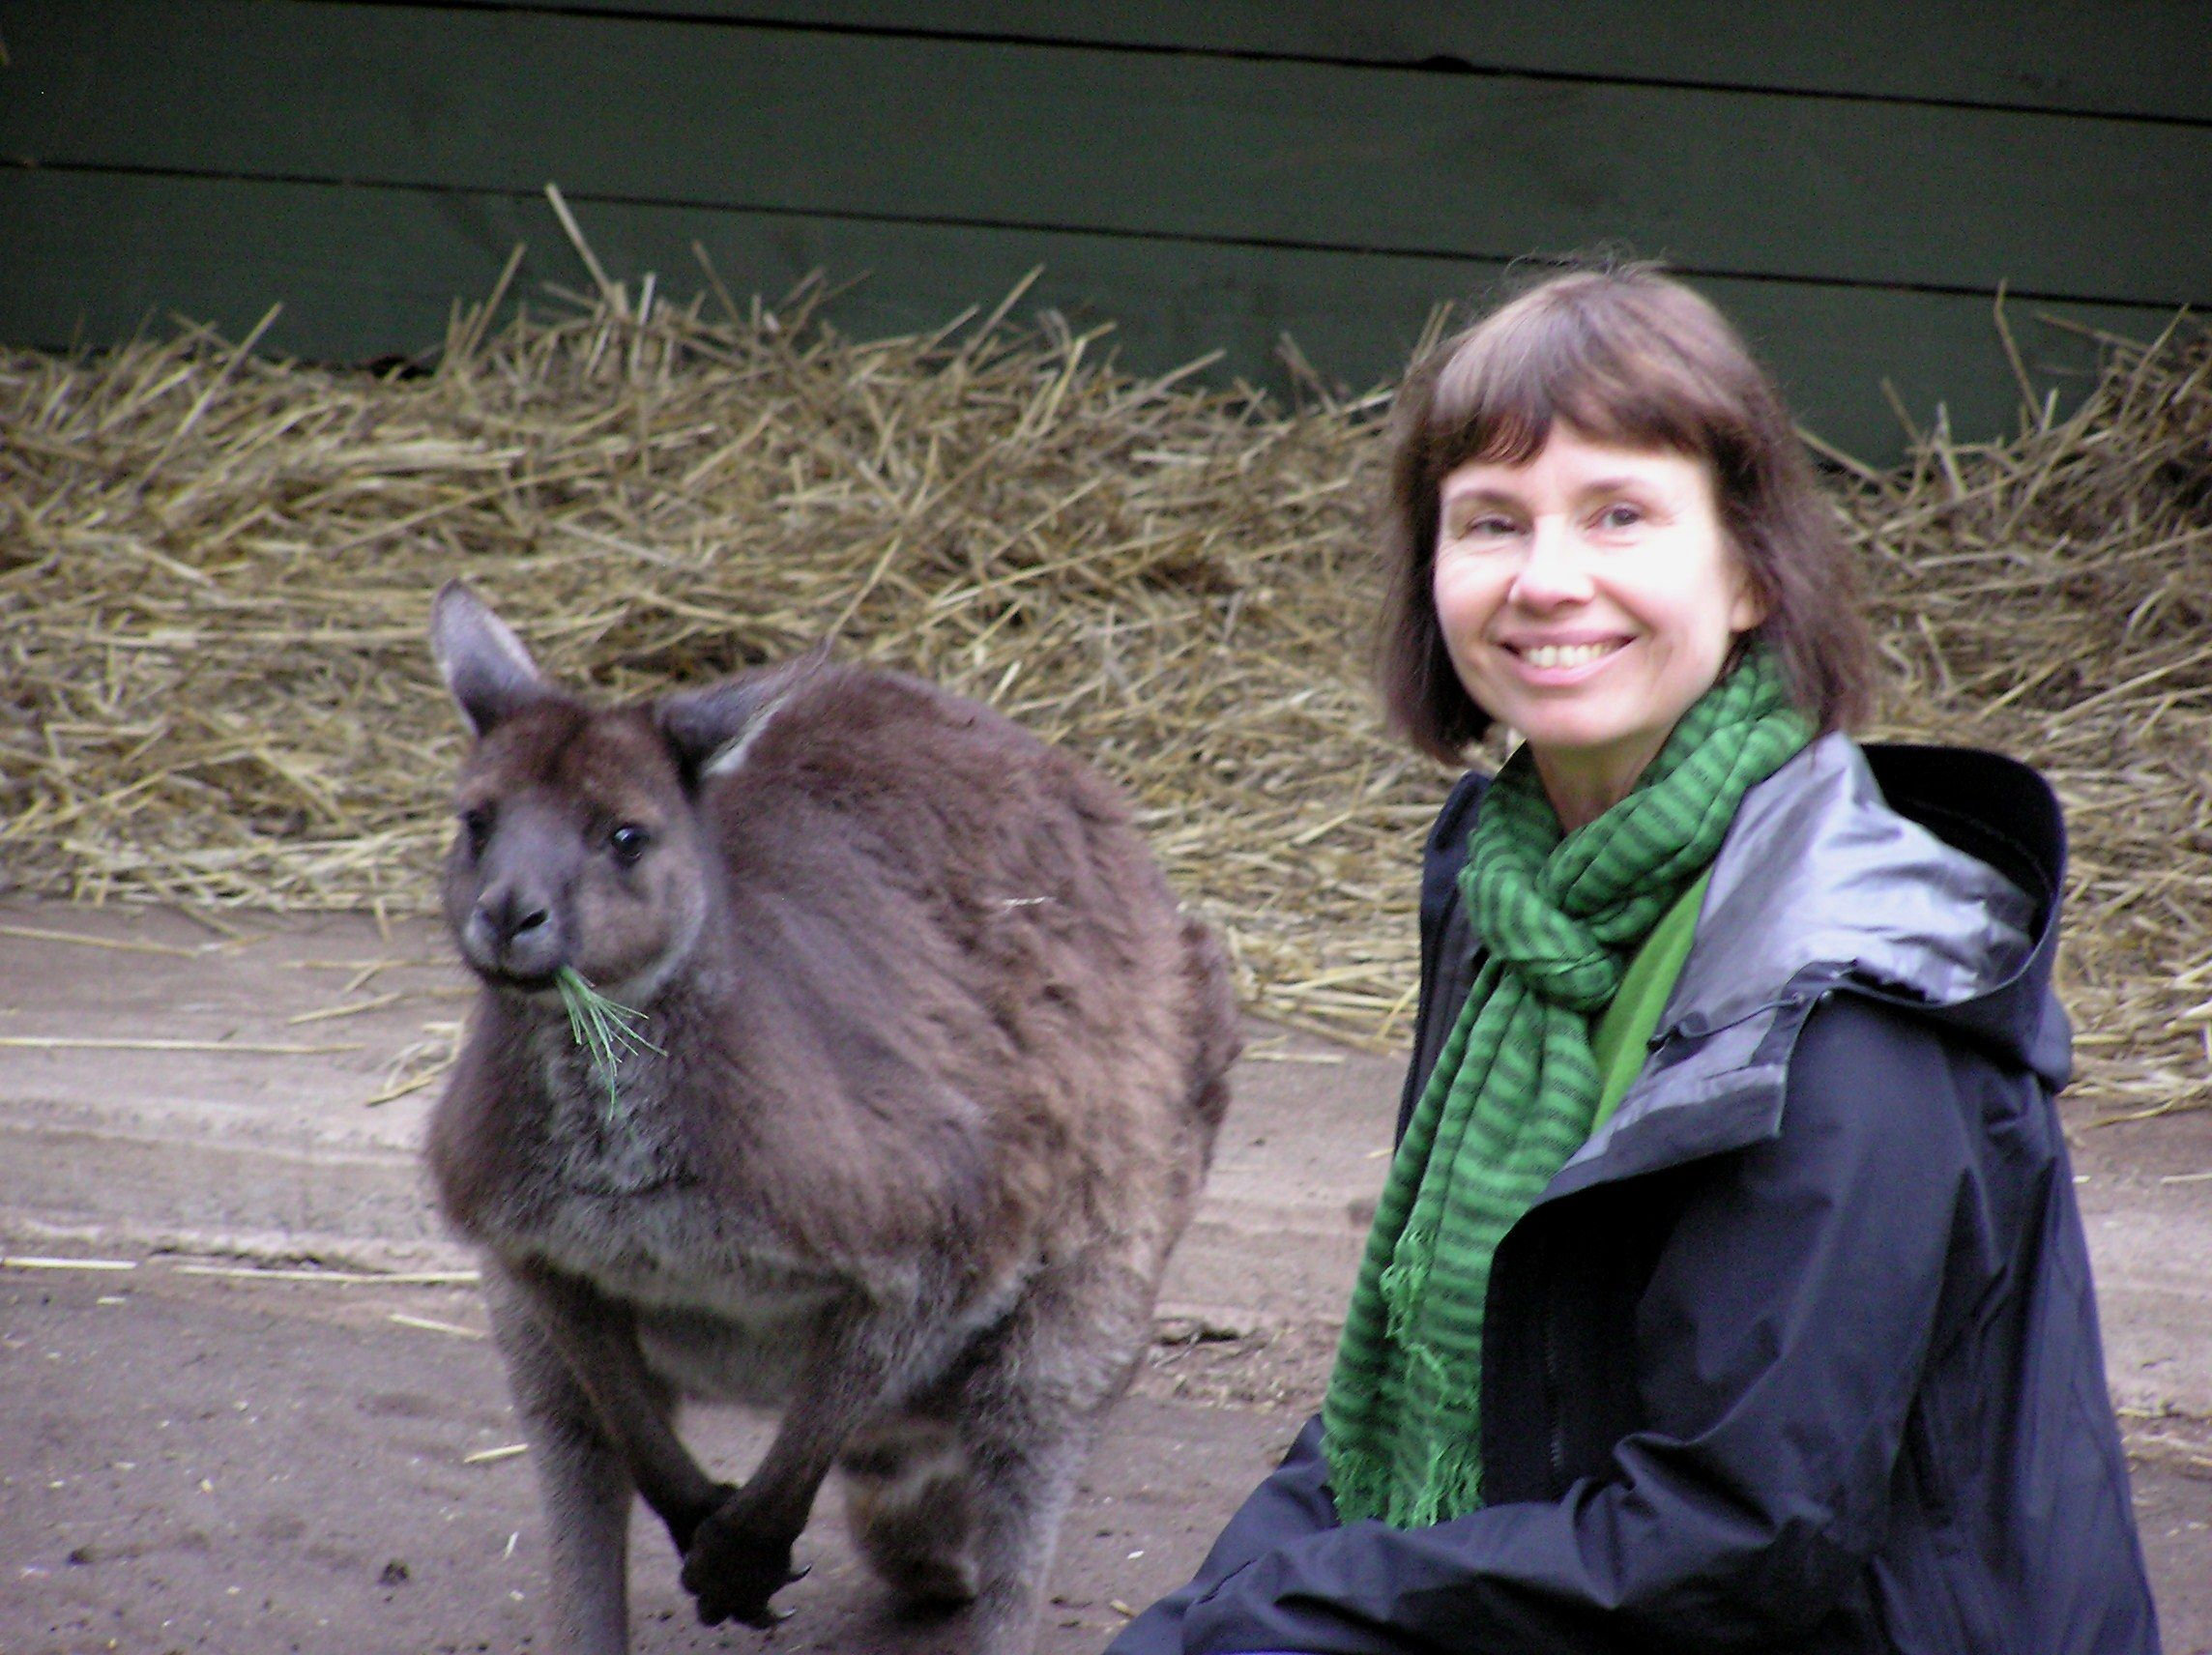 Healesville Sanctuary - Yarra Valley in Victoria, Australia